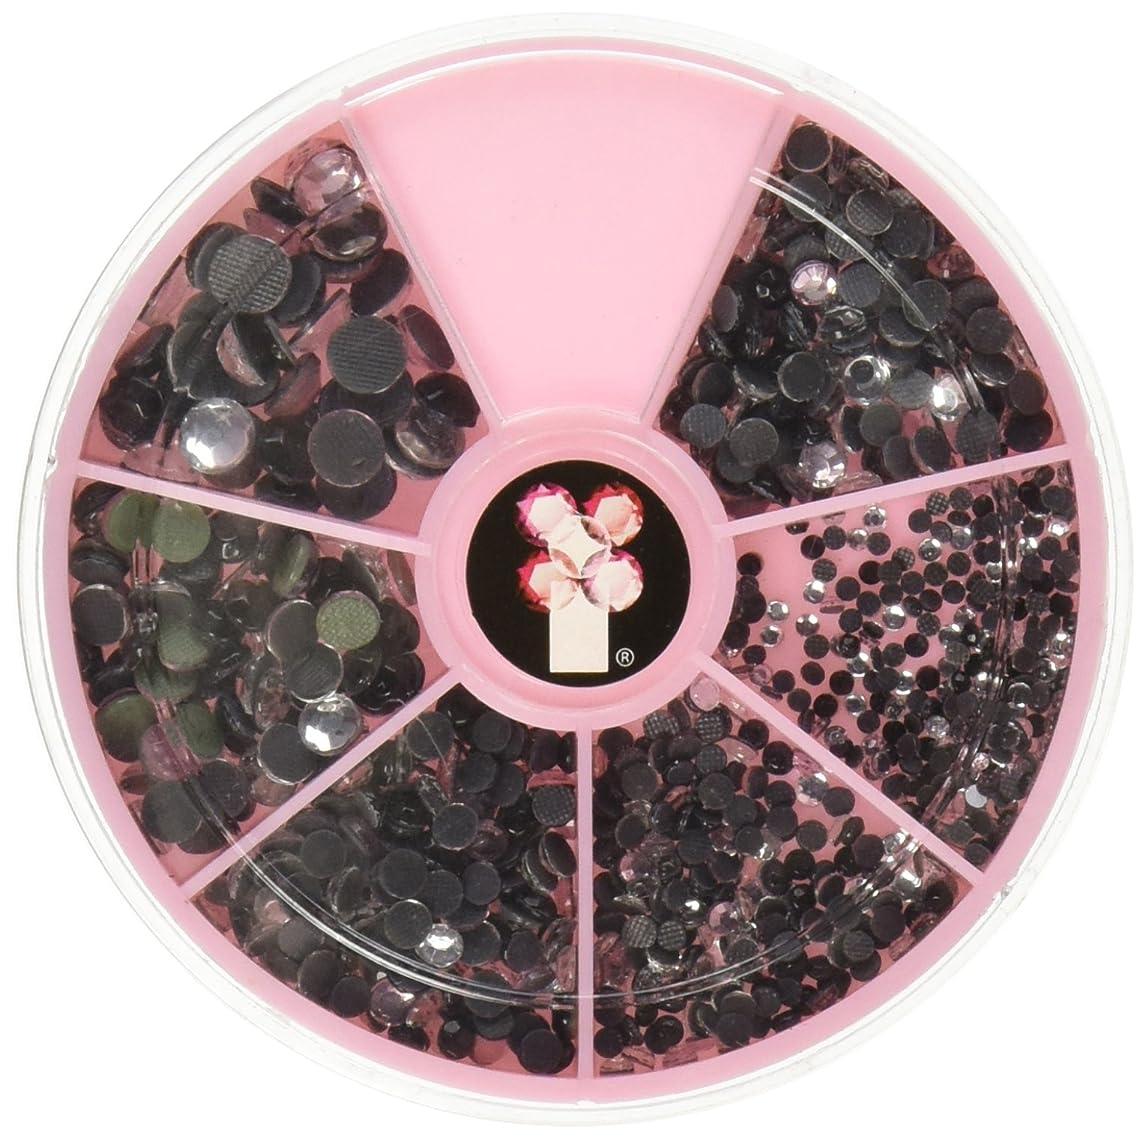 Imaginisce IR002268 I-Rock Hot Rocks Adhesive Gems, 2.3 mm x 6 mm, Pink/Black/Clear